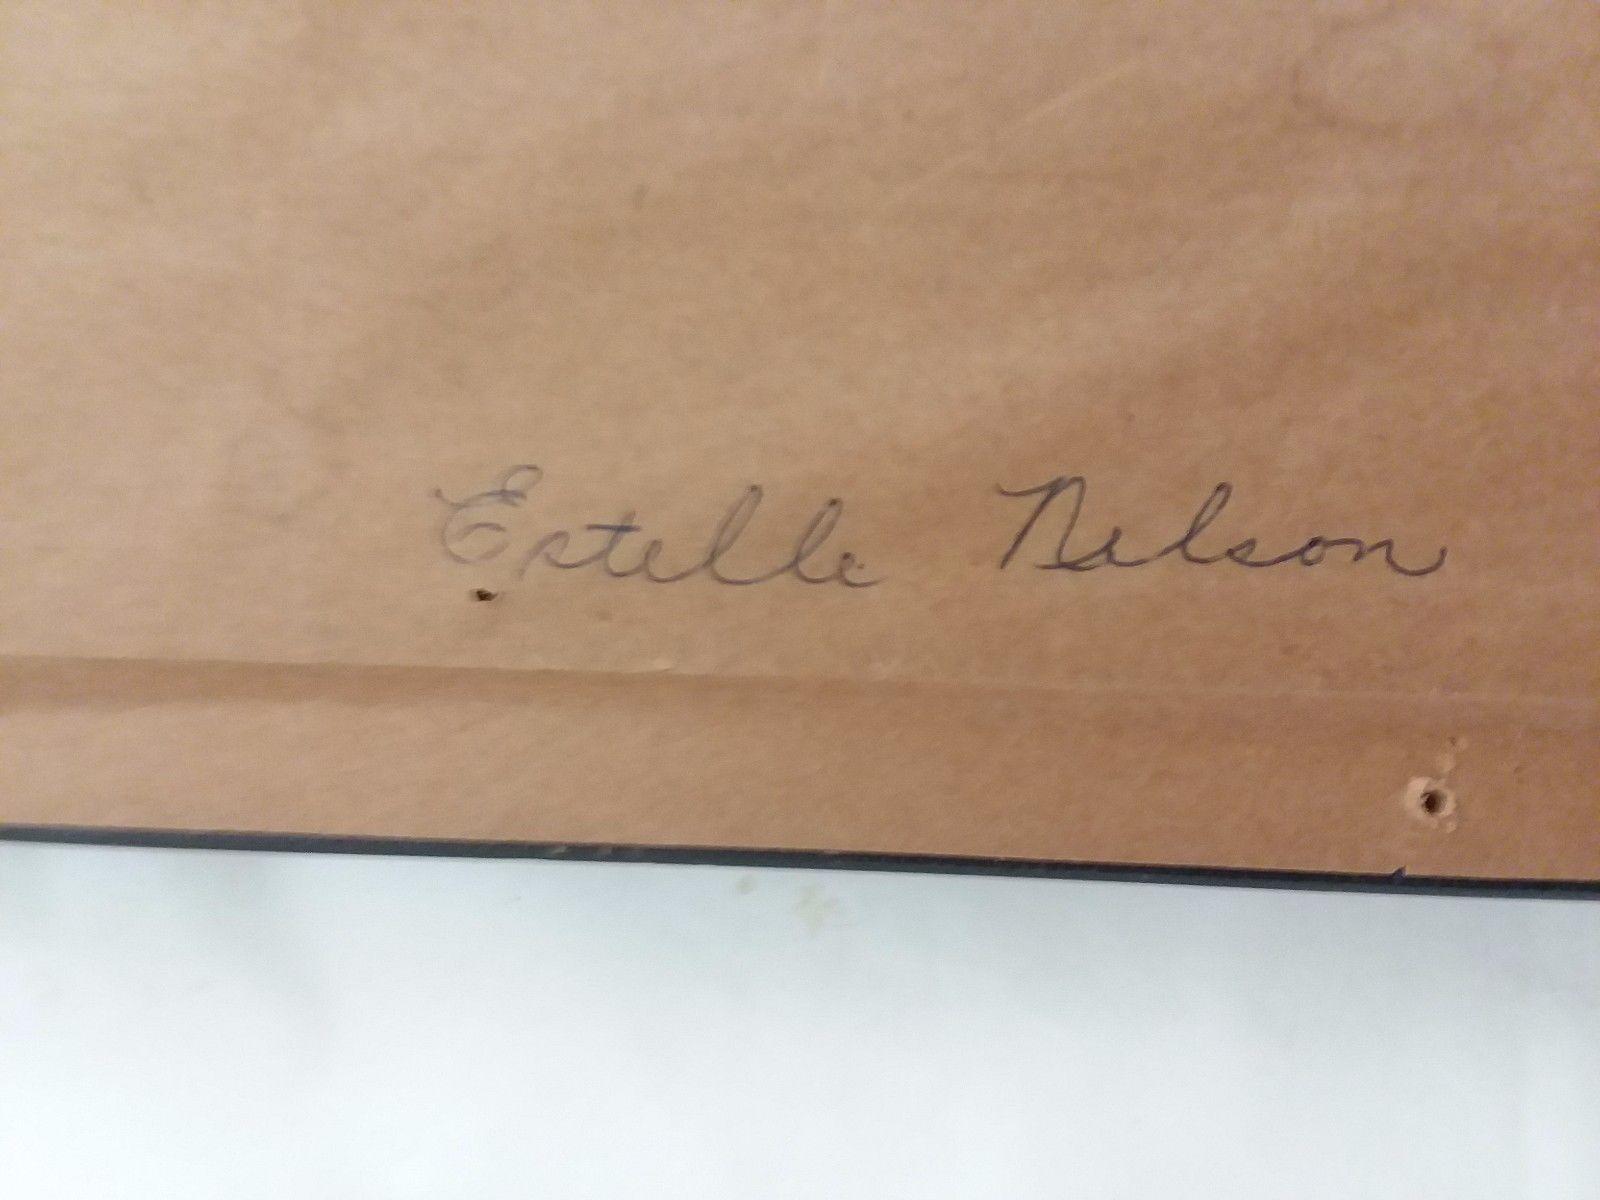 "Framed Art Driftwood Wall Hanging 36"" x 9"" Signed Estelle Nelson"